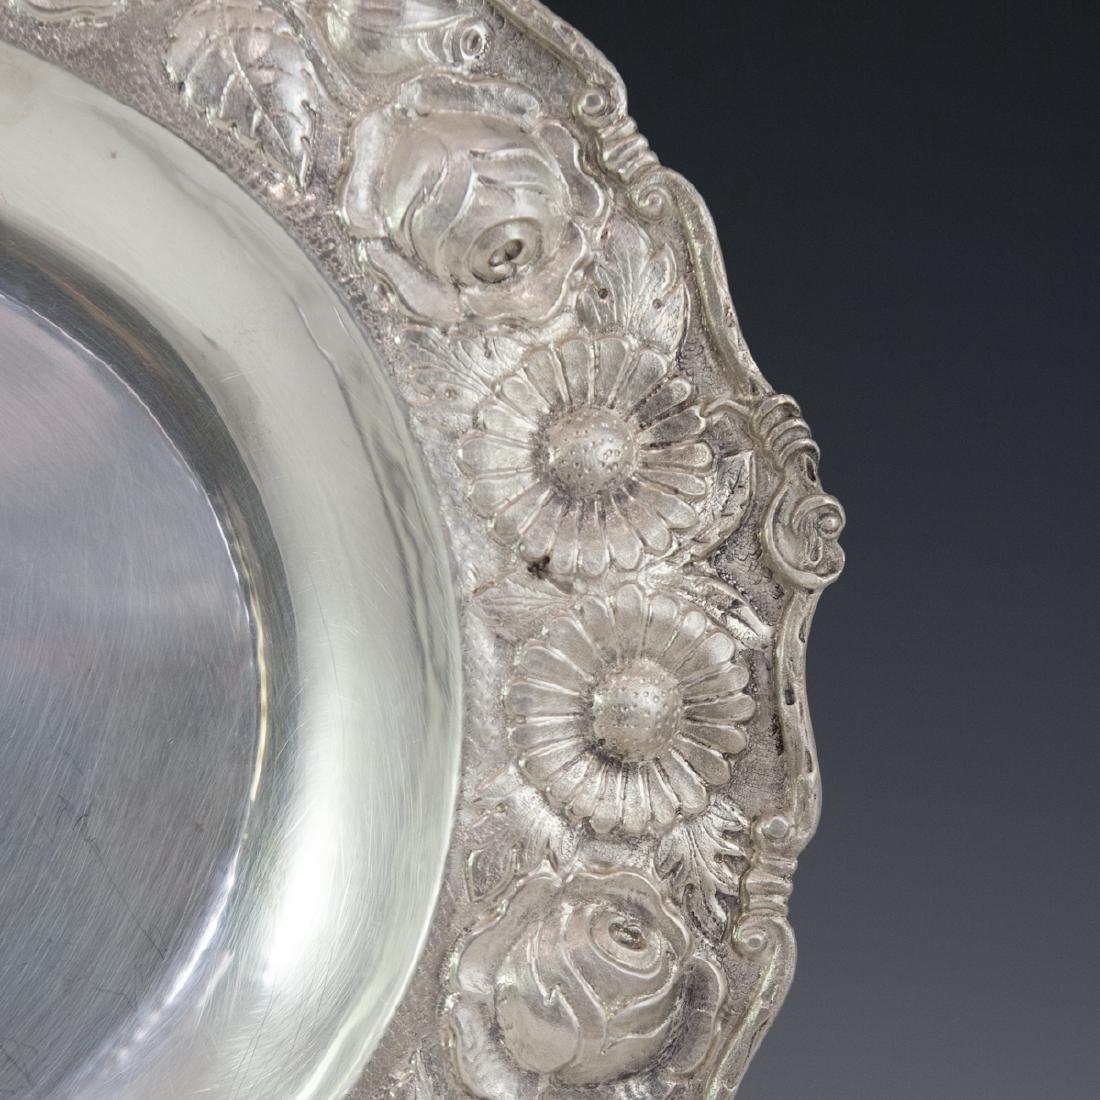 Romana 900 Silver Repousse Tray - 4